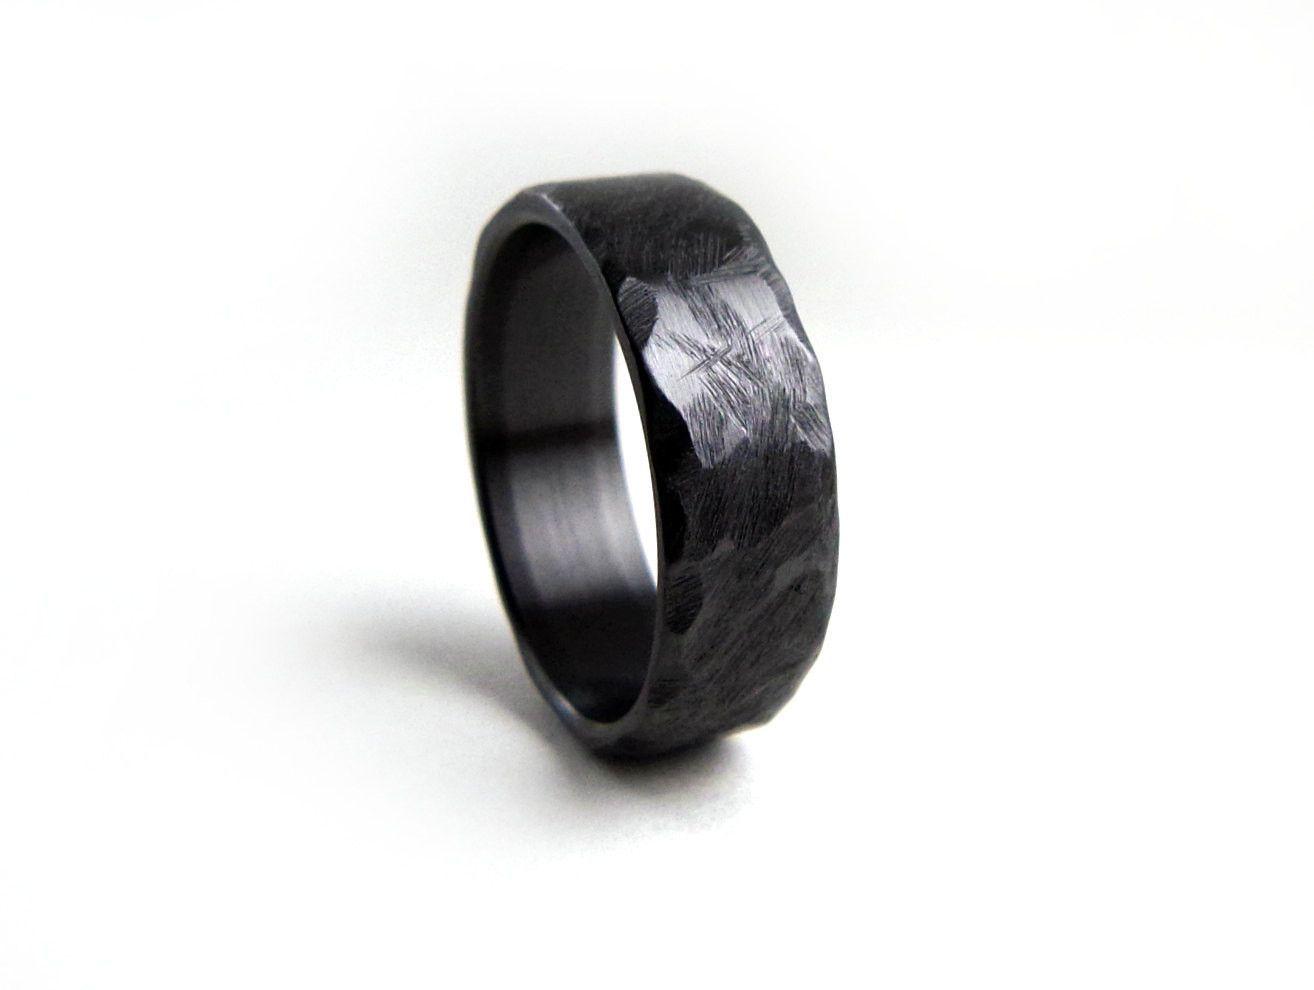 Black Wedding Band Hammered Ring Zirconium Engagement Men S Women Handmade